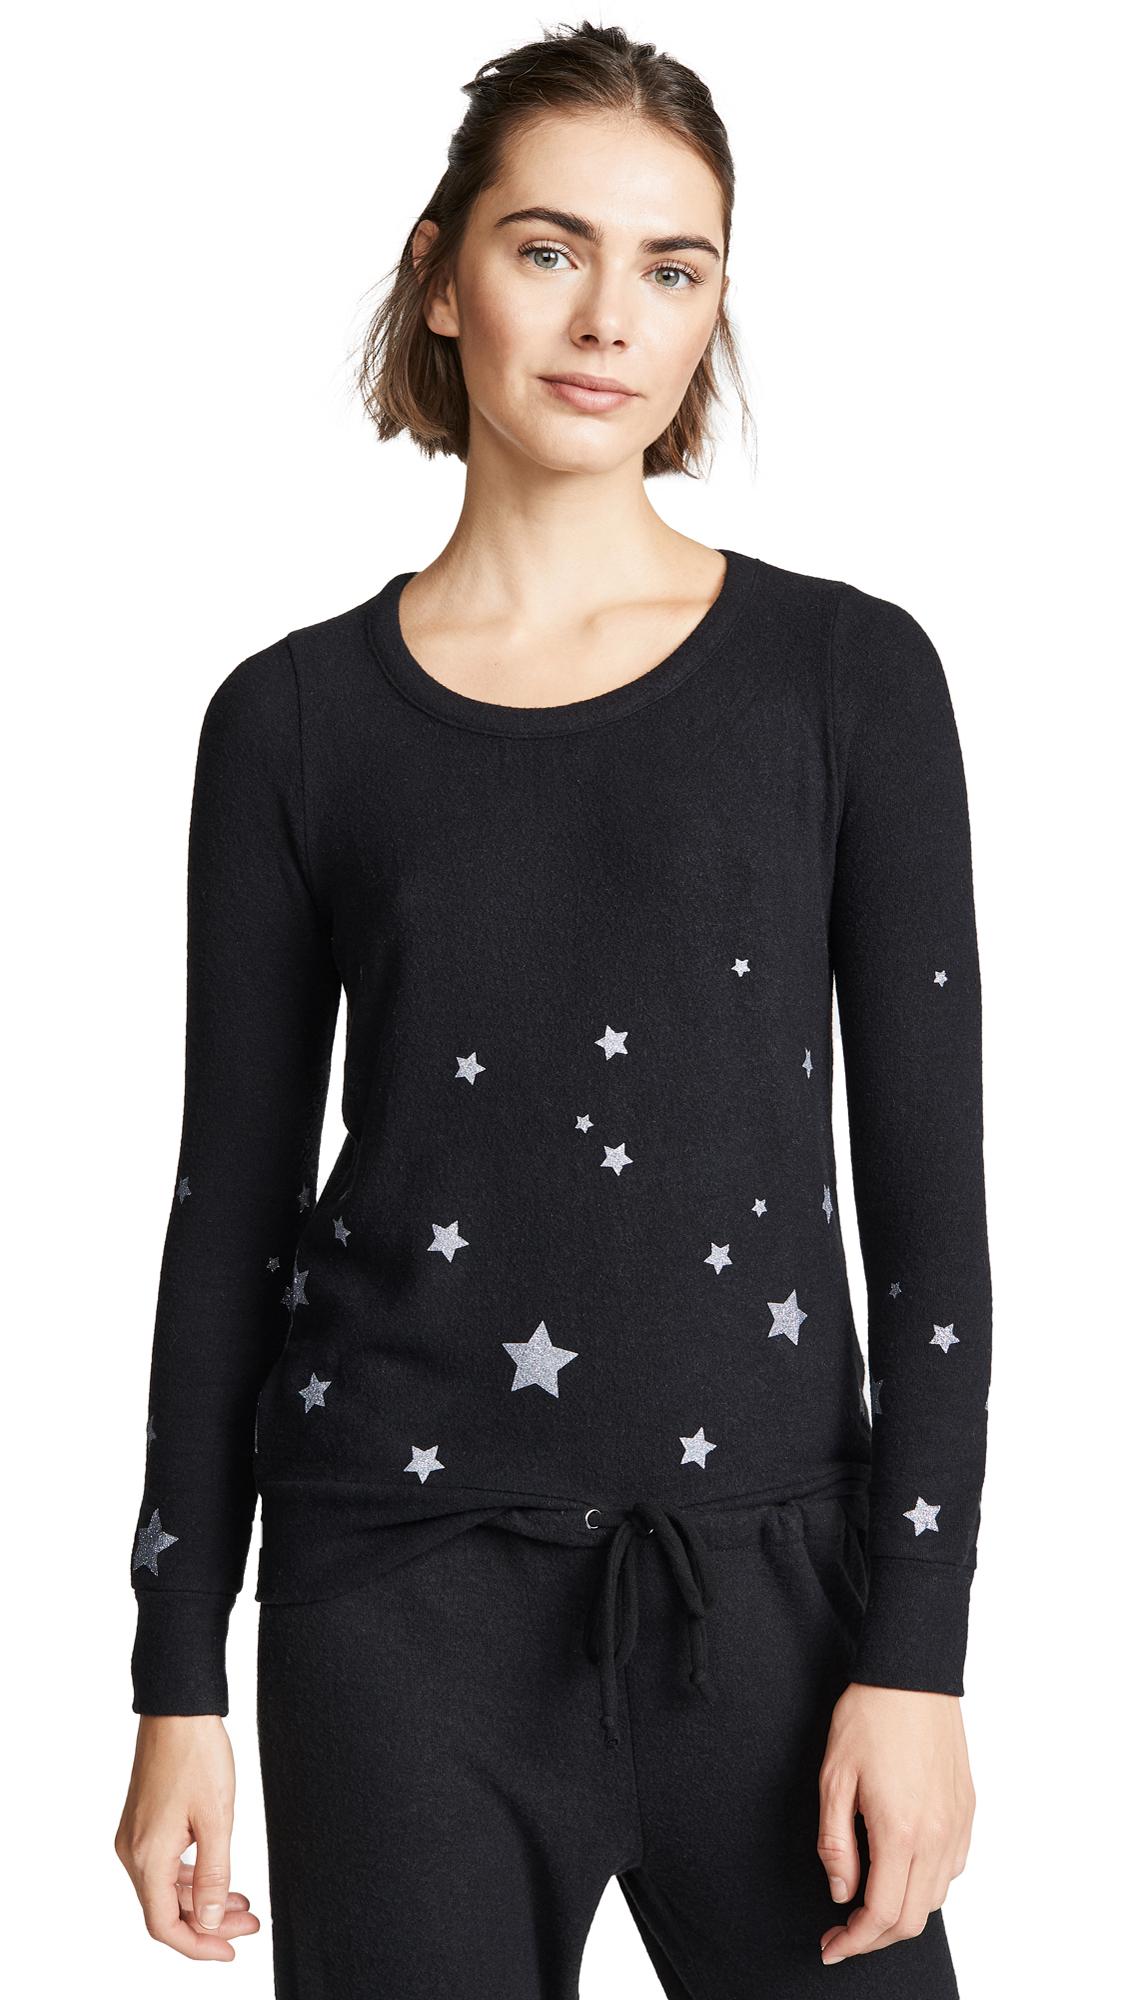 Chaser Starry Black Sweatshirt In True Black